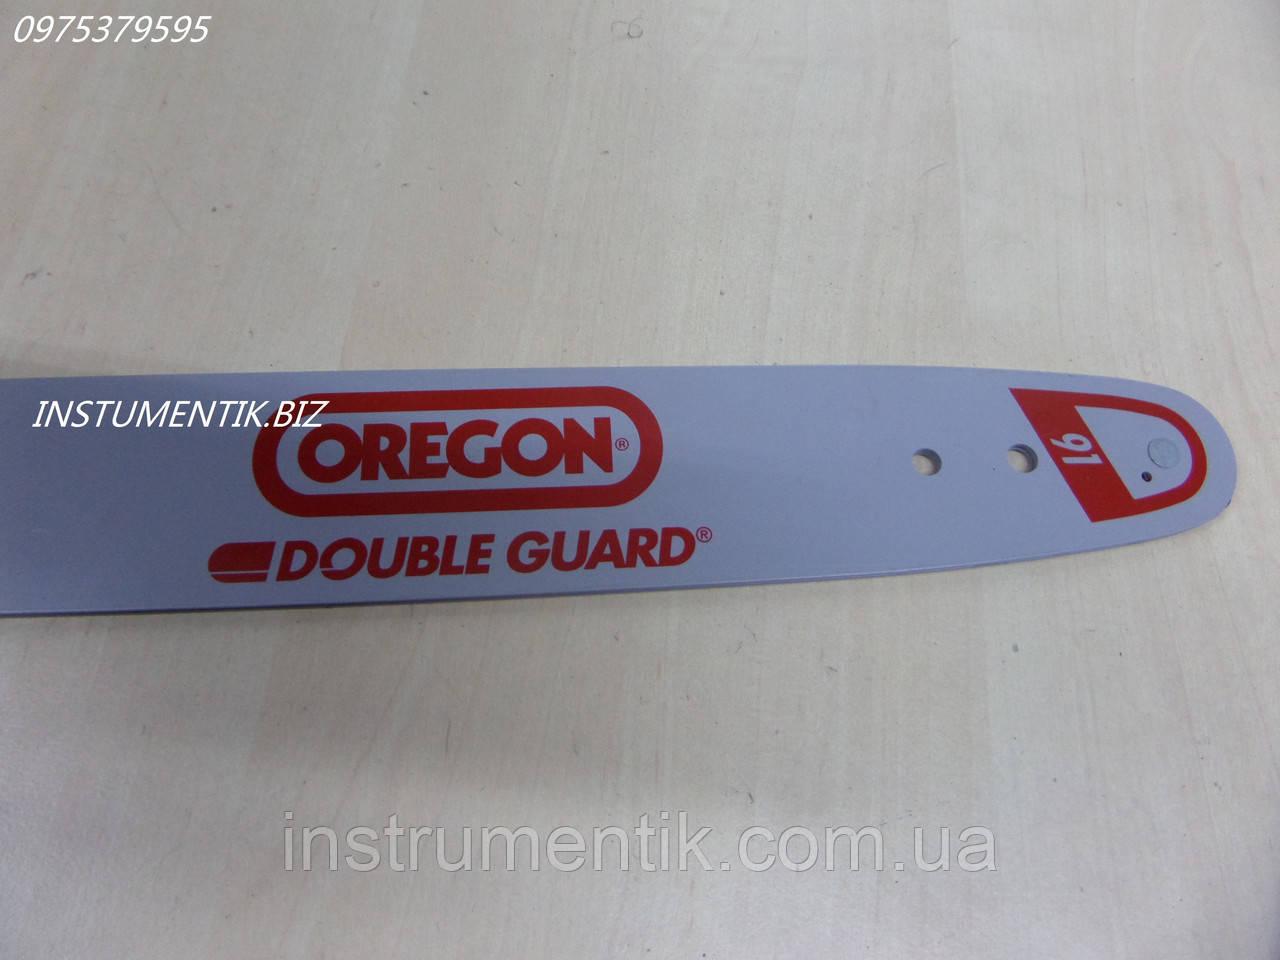 Шина OREGON для Oleo Mac GS 410 C, GS 370